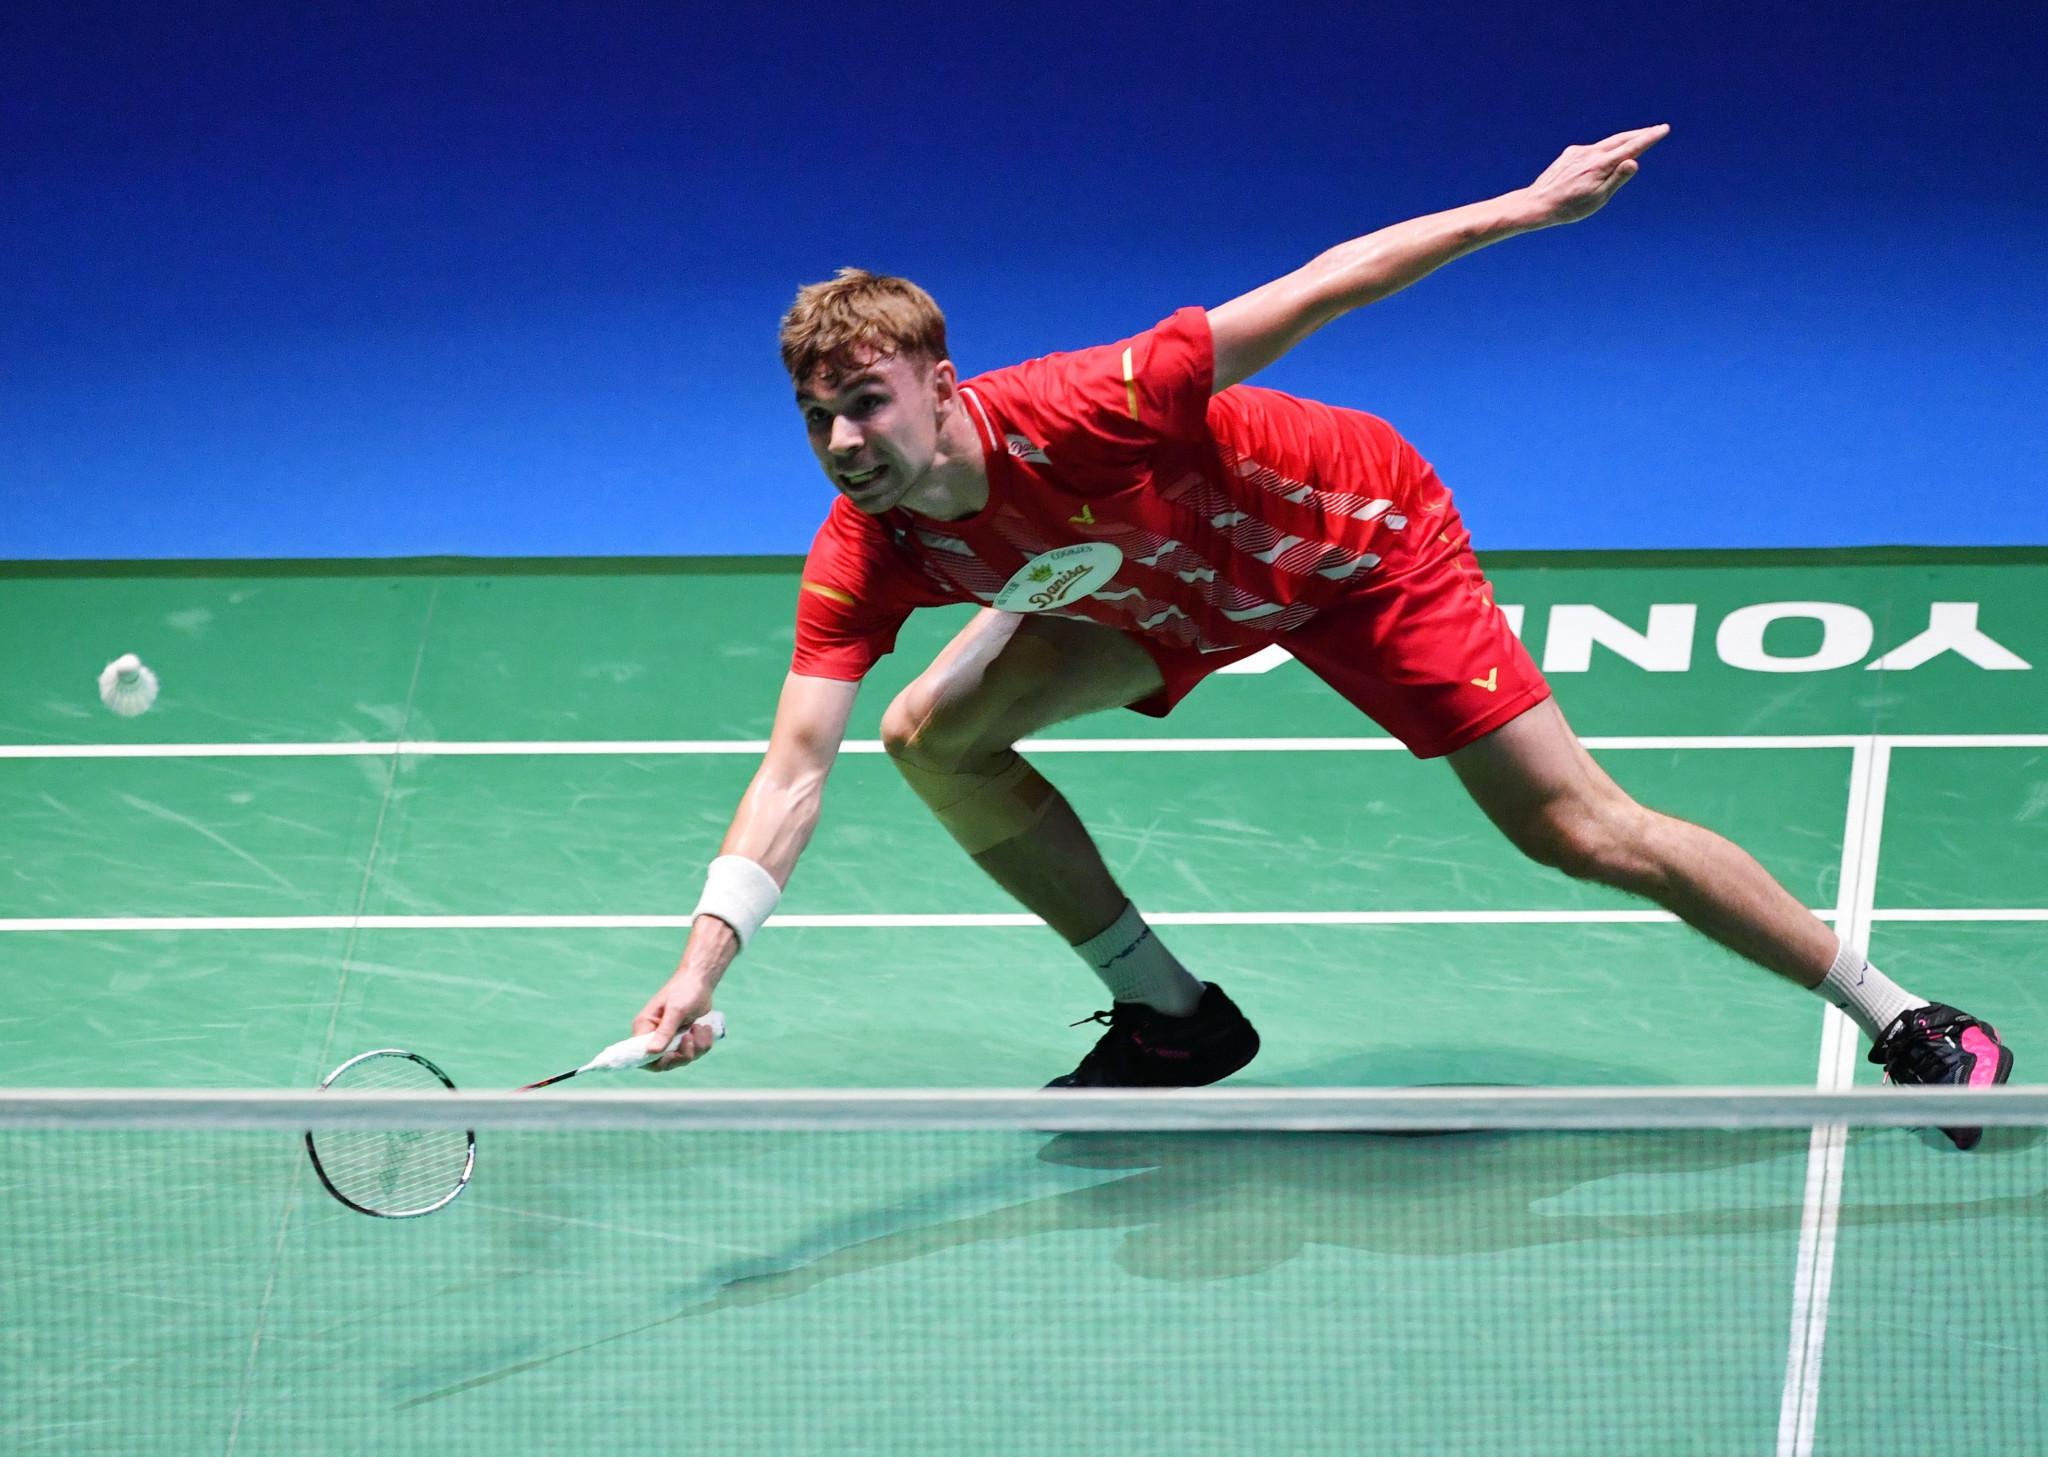 Koljonen shocks Gemke to reach semis at European Badminton Championships